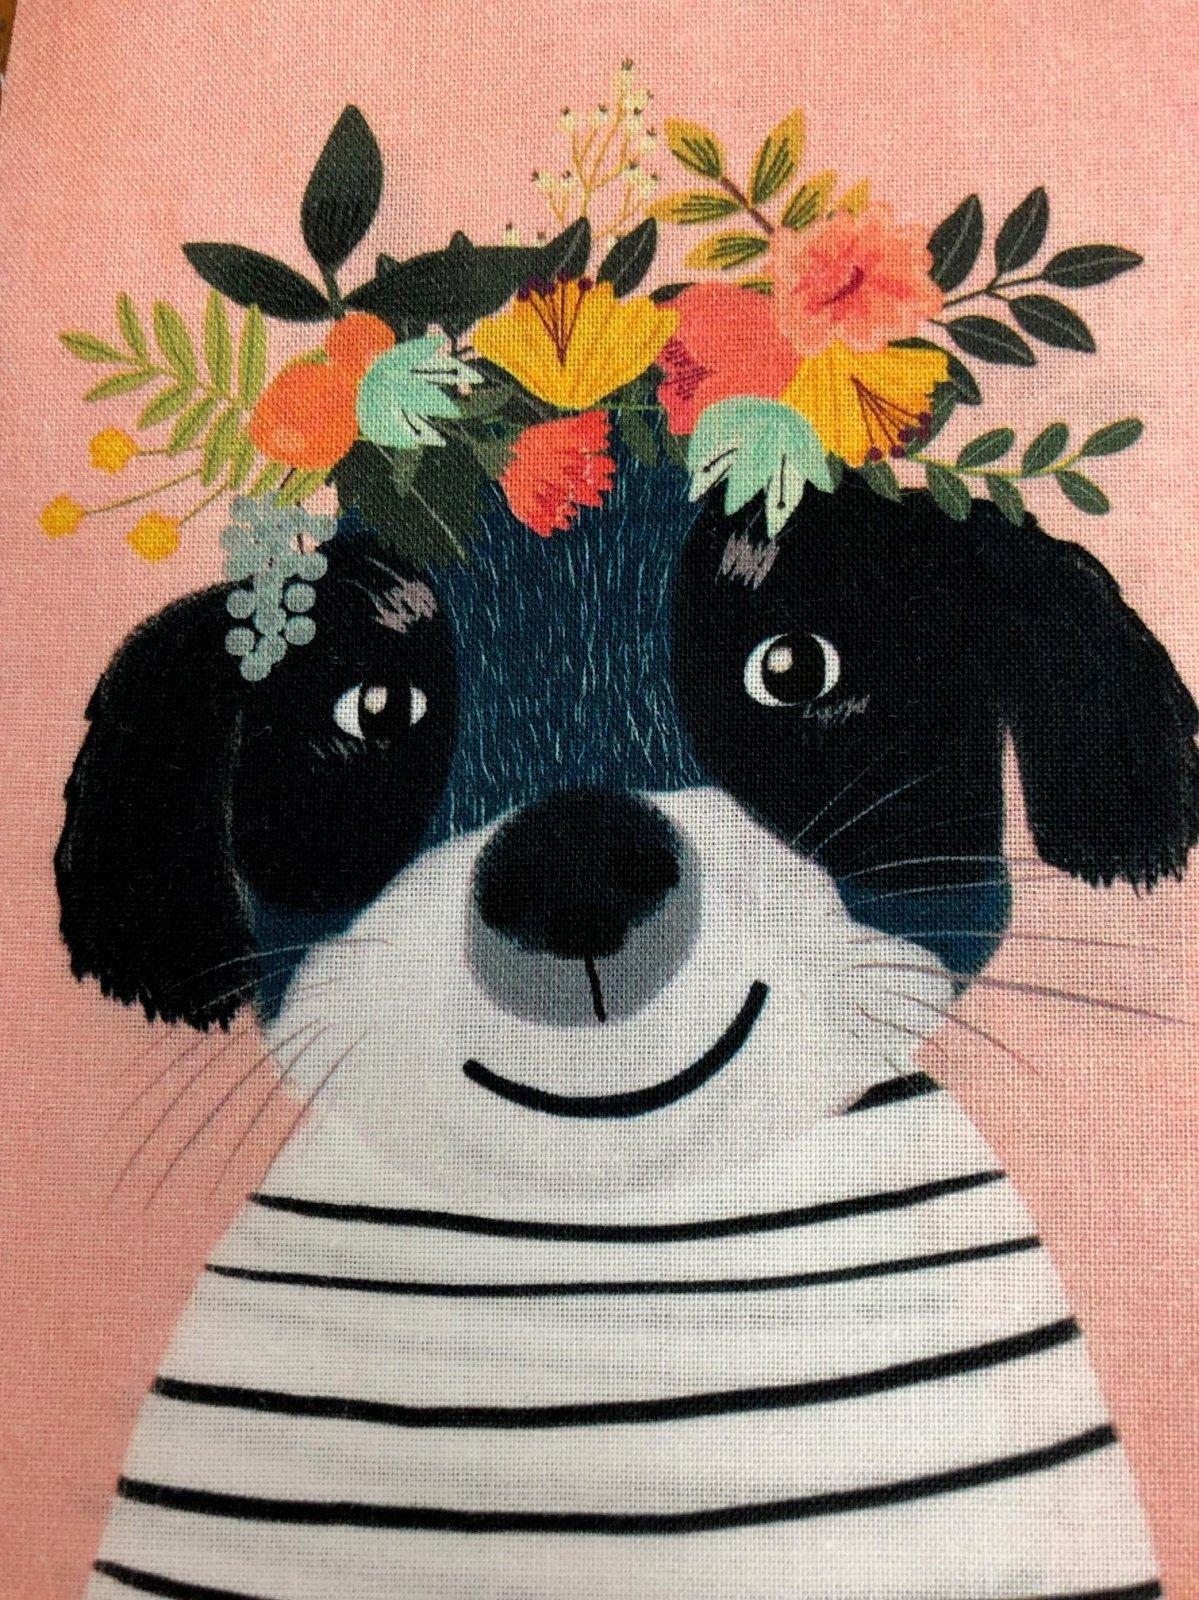 Postcard Kit Sm - Dogs 6x4.25in